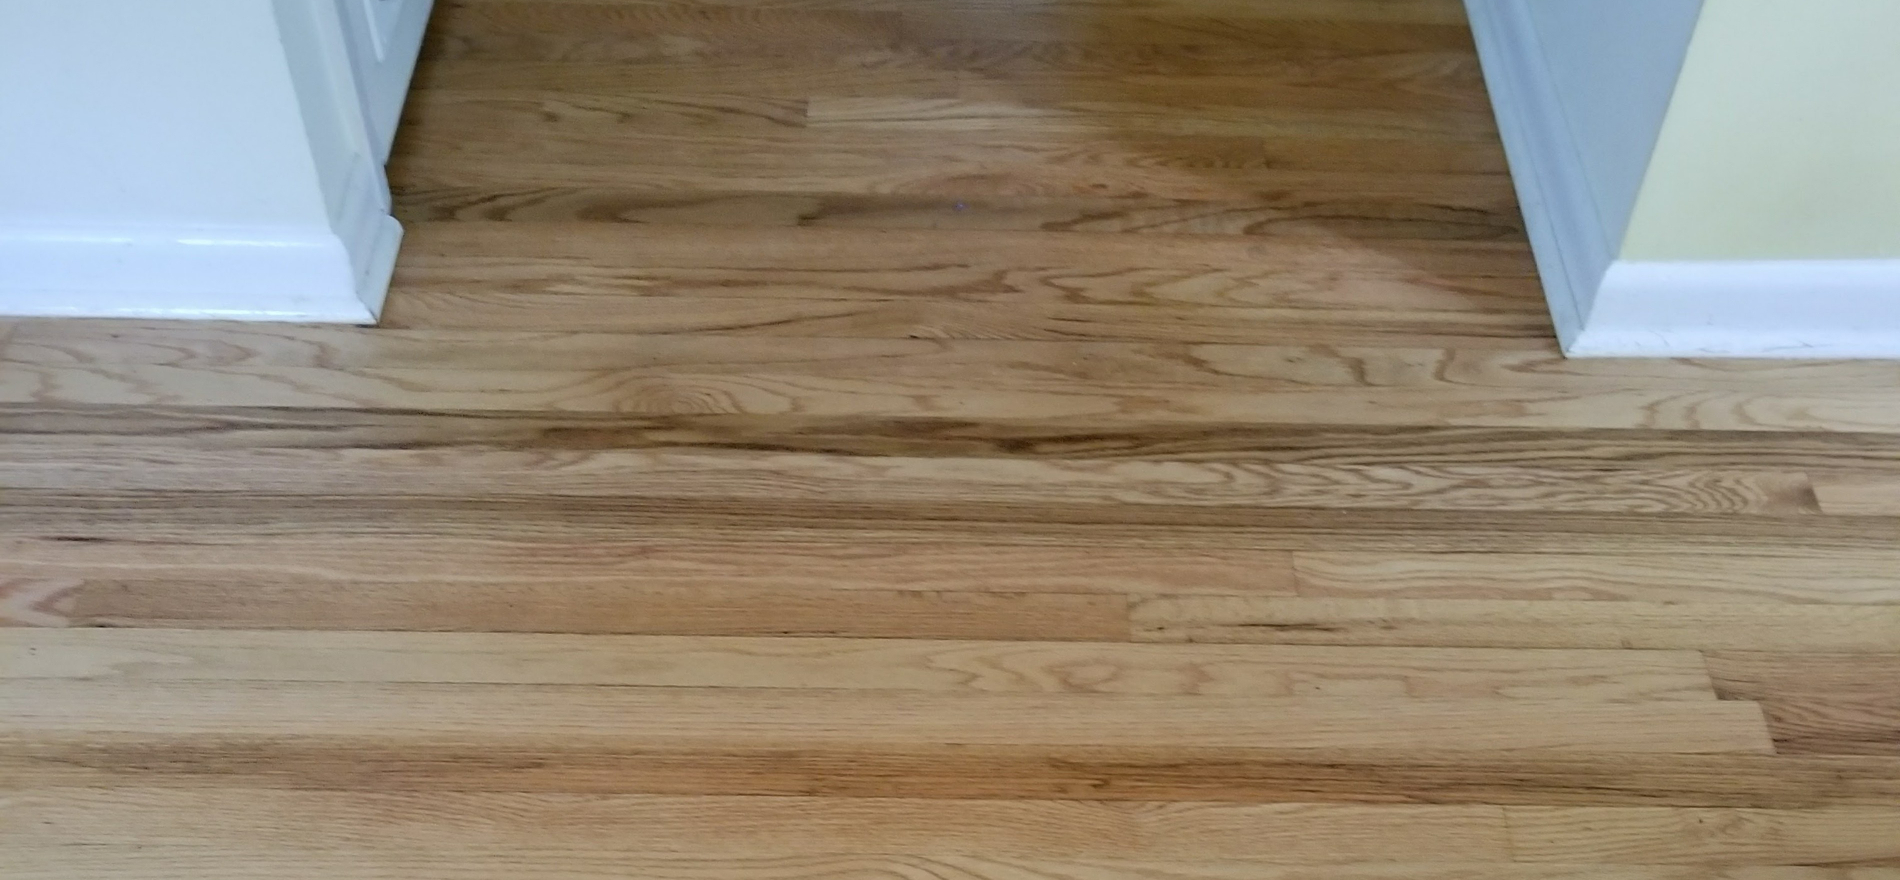 flooring10 Flooring Photos